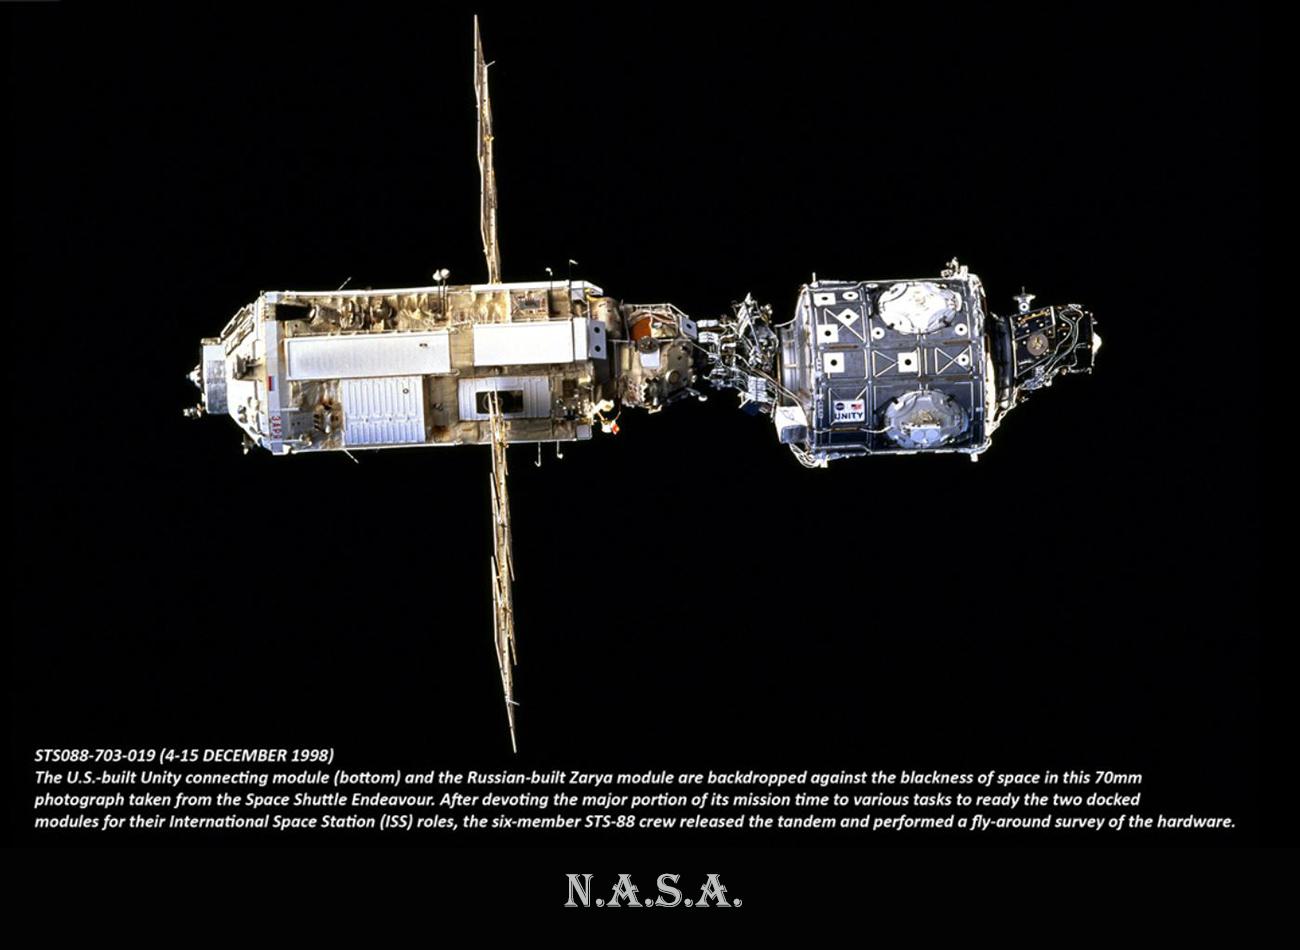 NASA-Conexion modulos-Zarya-WEB